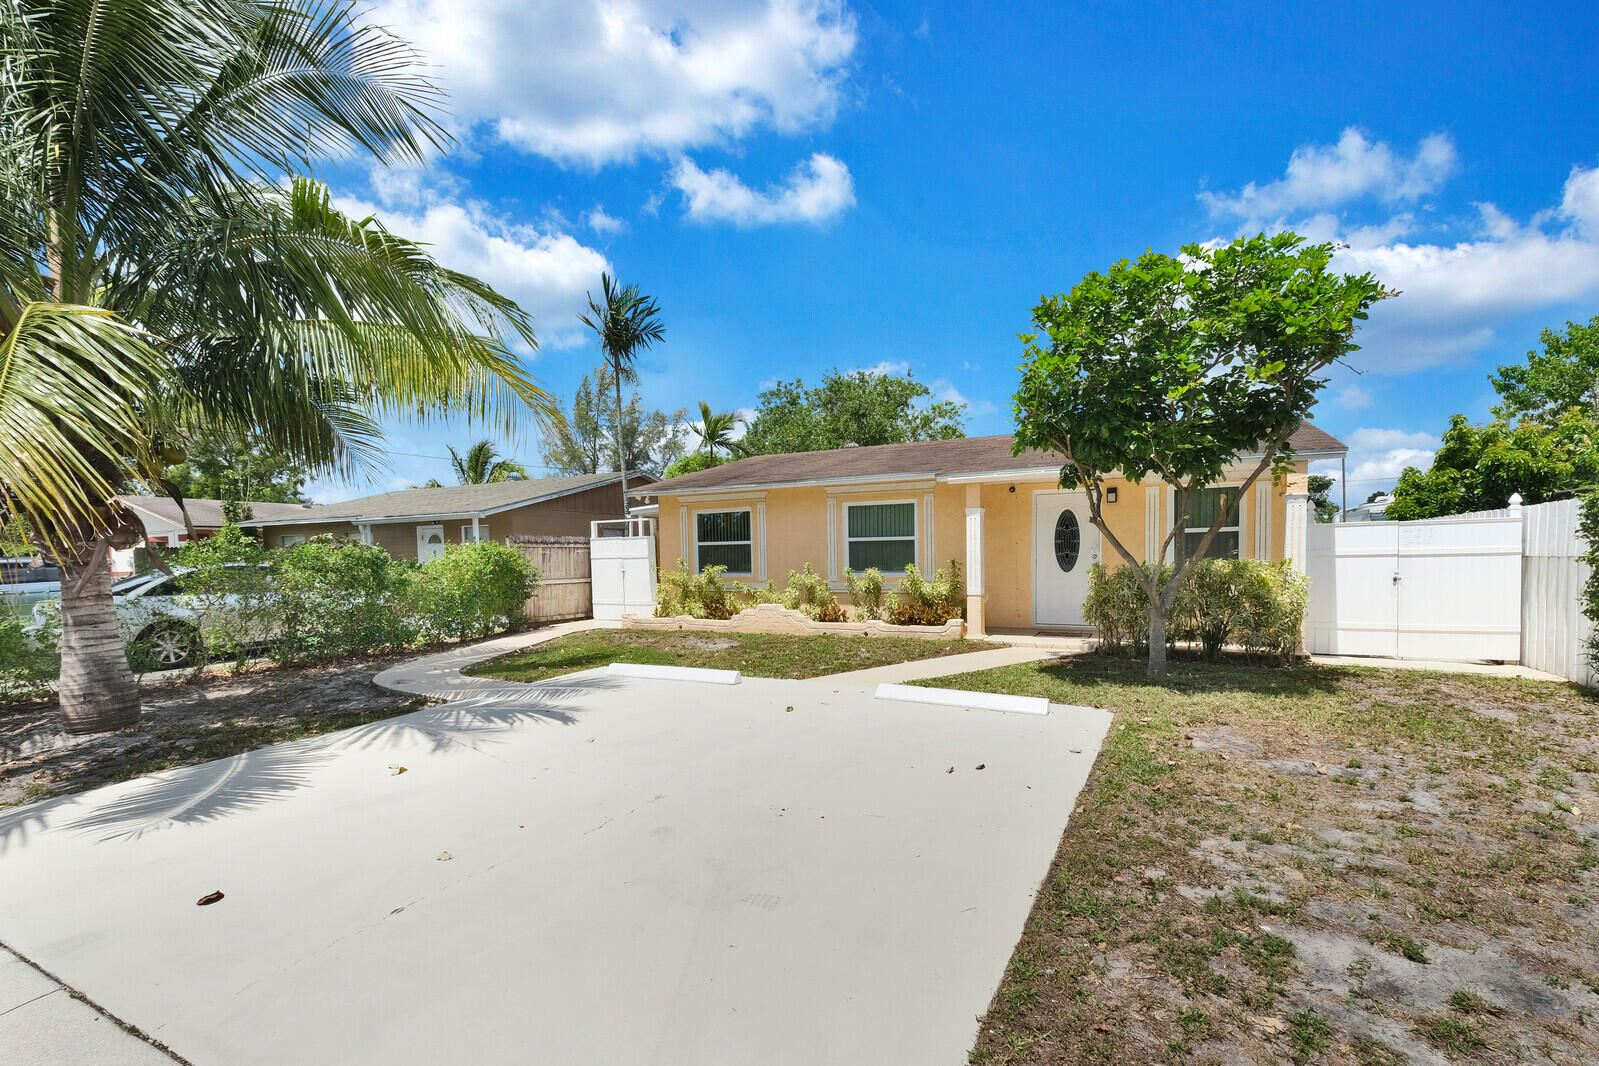 171 Marguerita Drive, West Palm Beach, FL 33415 - MLS#: RX-10722640